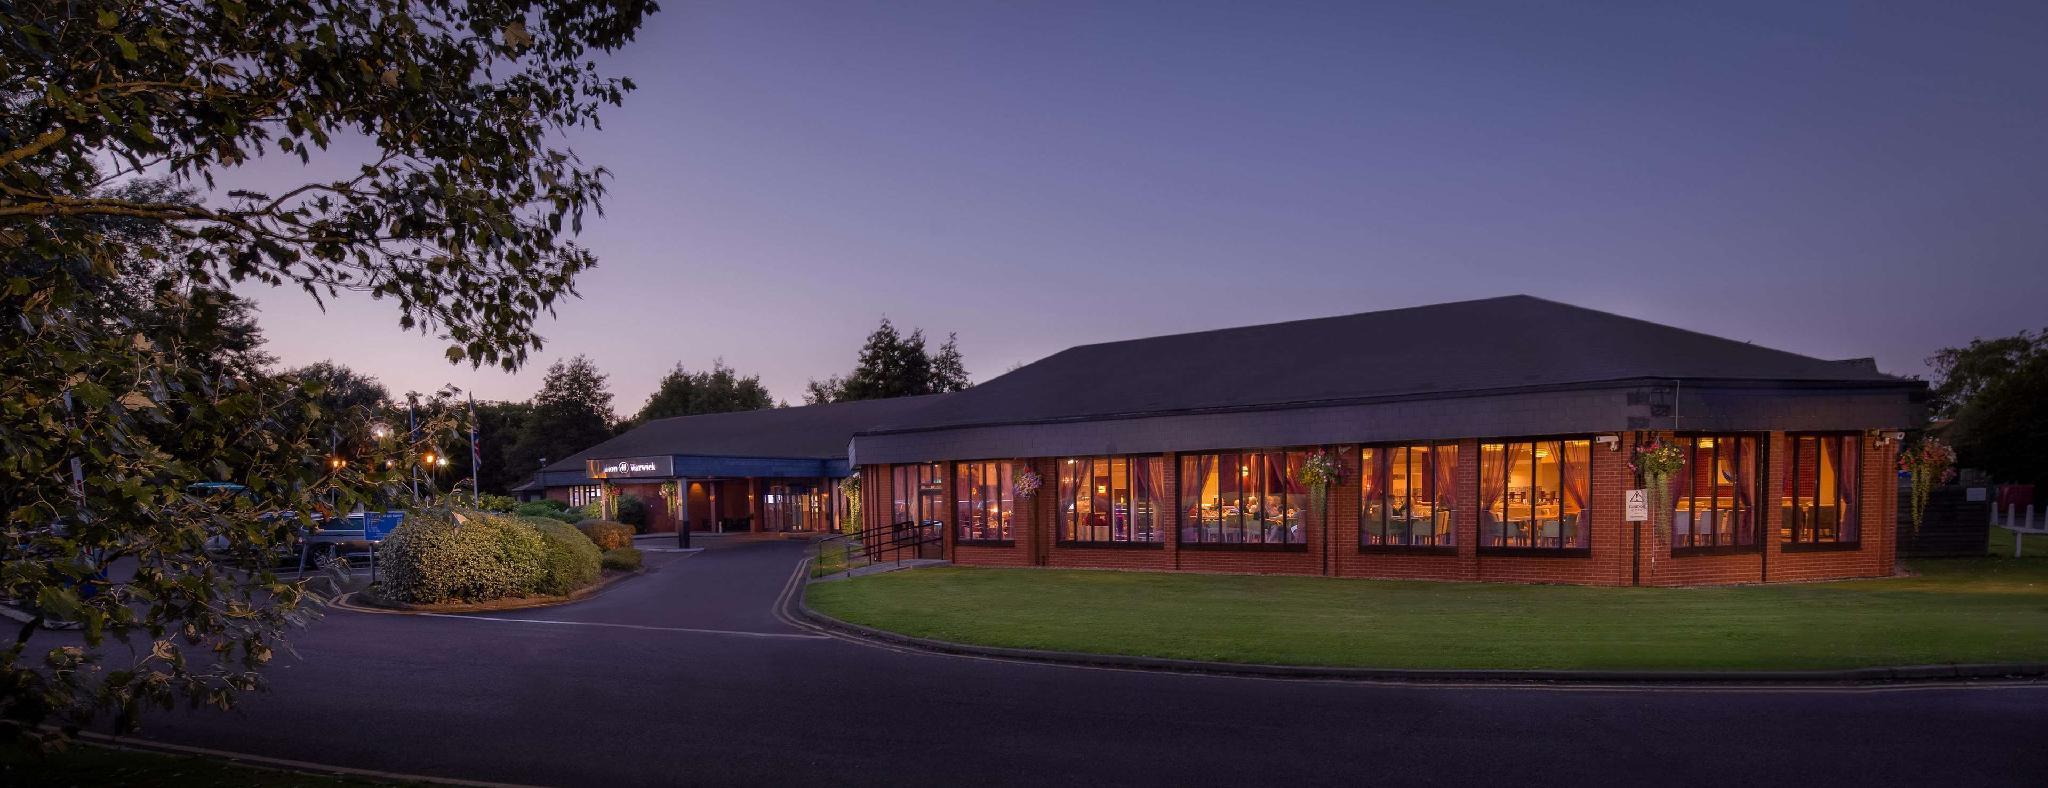 Hilton Warwick/Stratford-upon-Avon